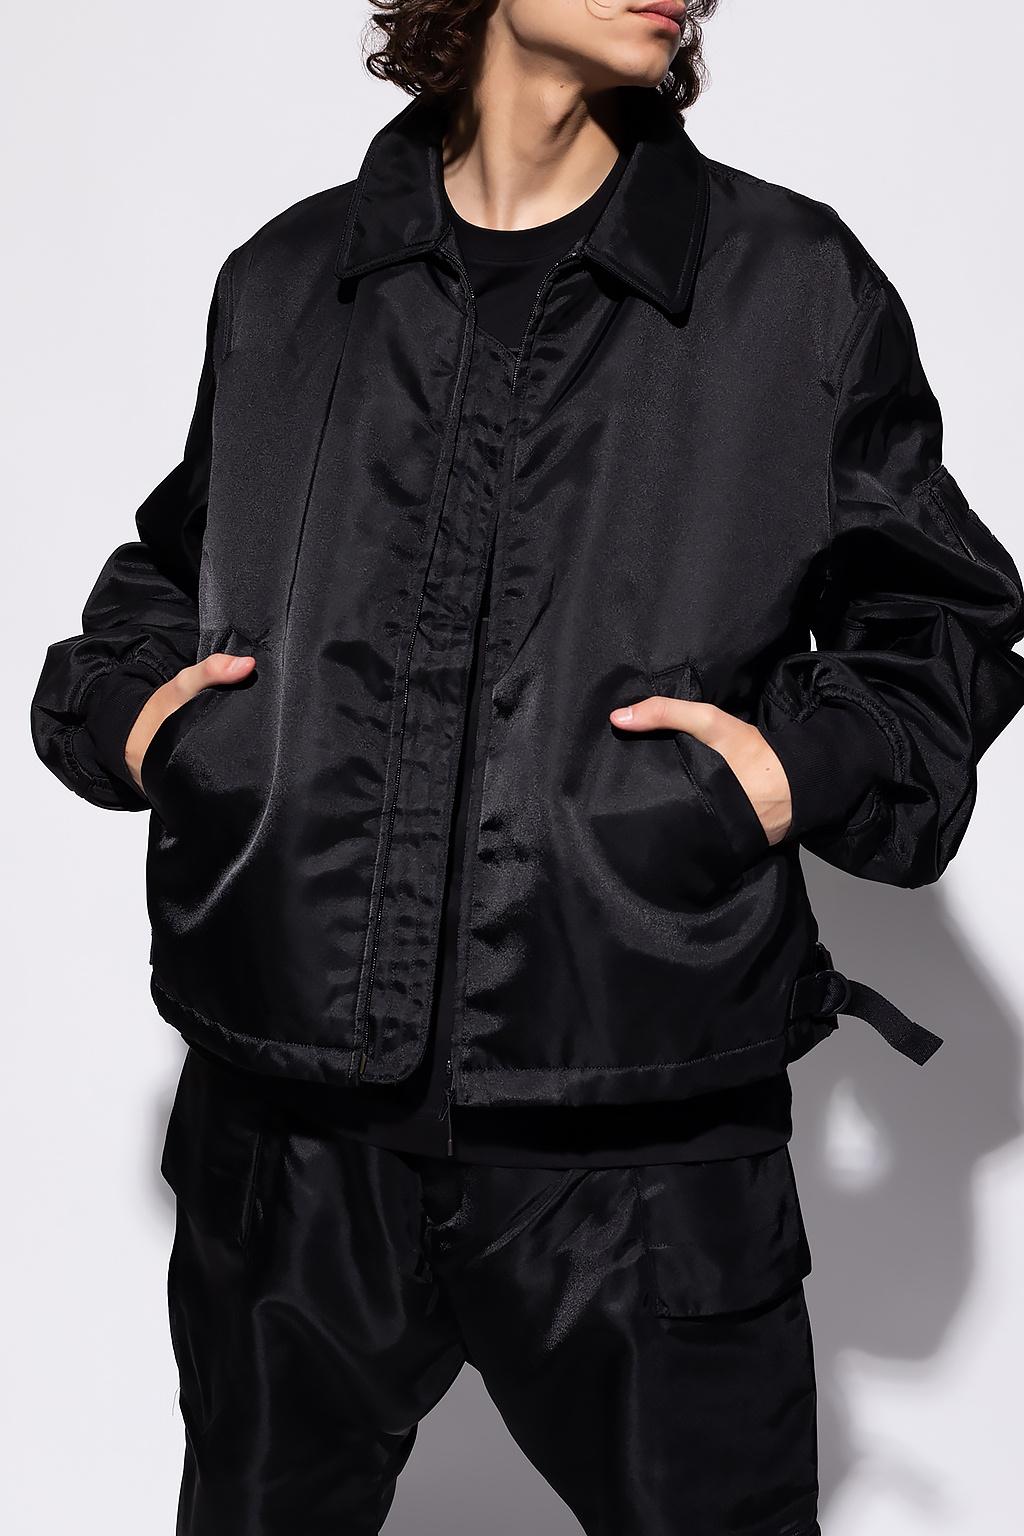 Y-3 Yohji Yamamoto Collared jacket